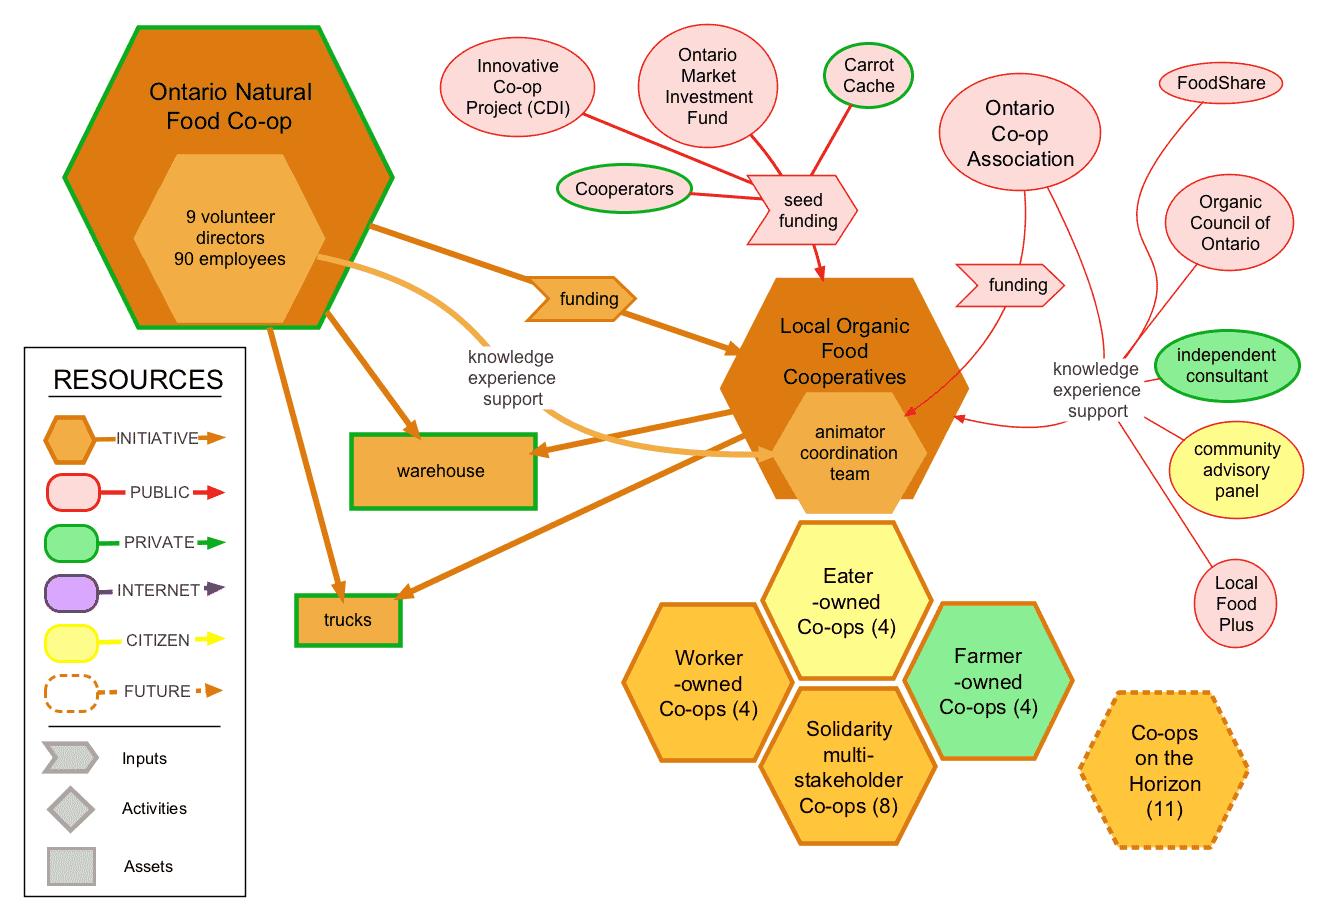 Impact customer behavior with PRWeb's enhanced distribution network